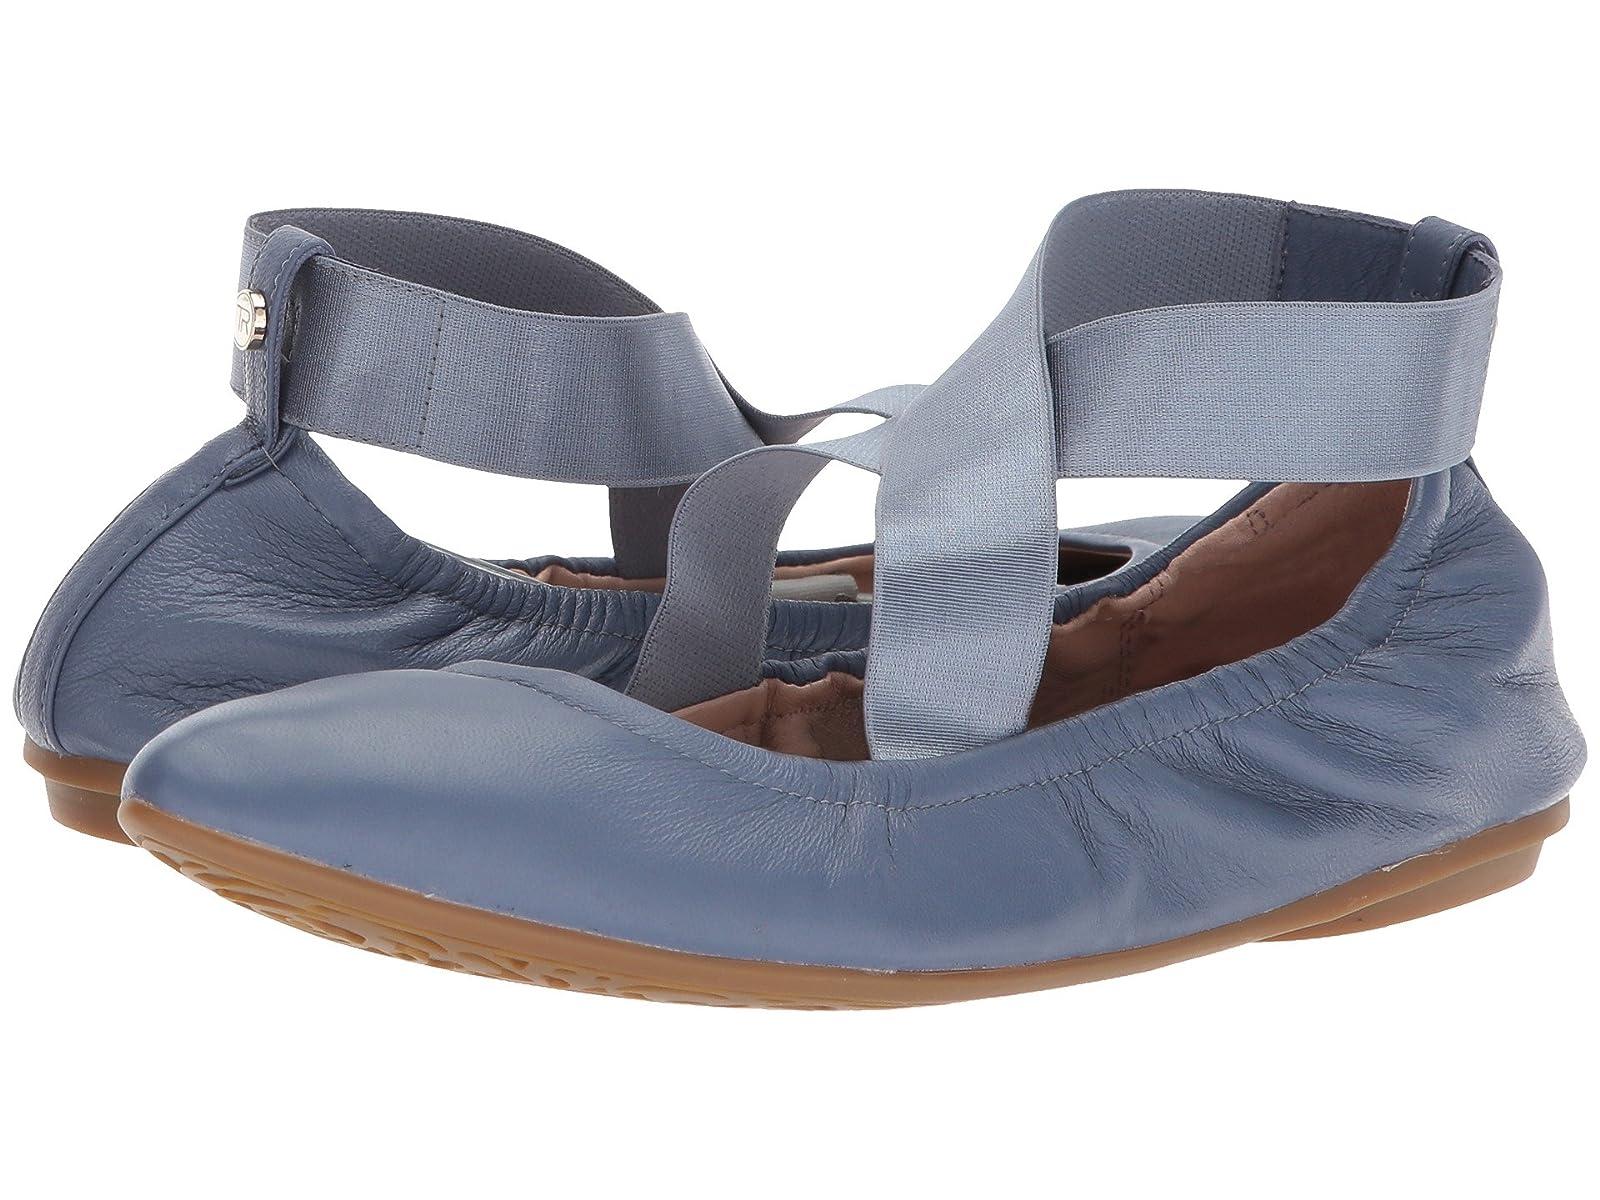 Taryn Rose EdinaCheap and distinctive eye-catching shoes